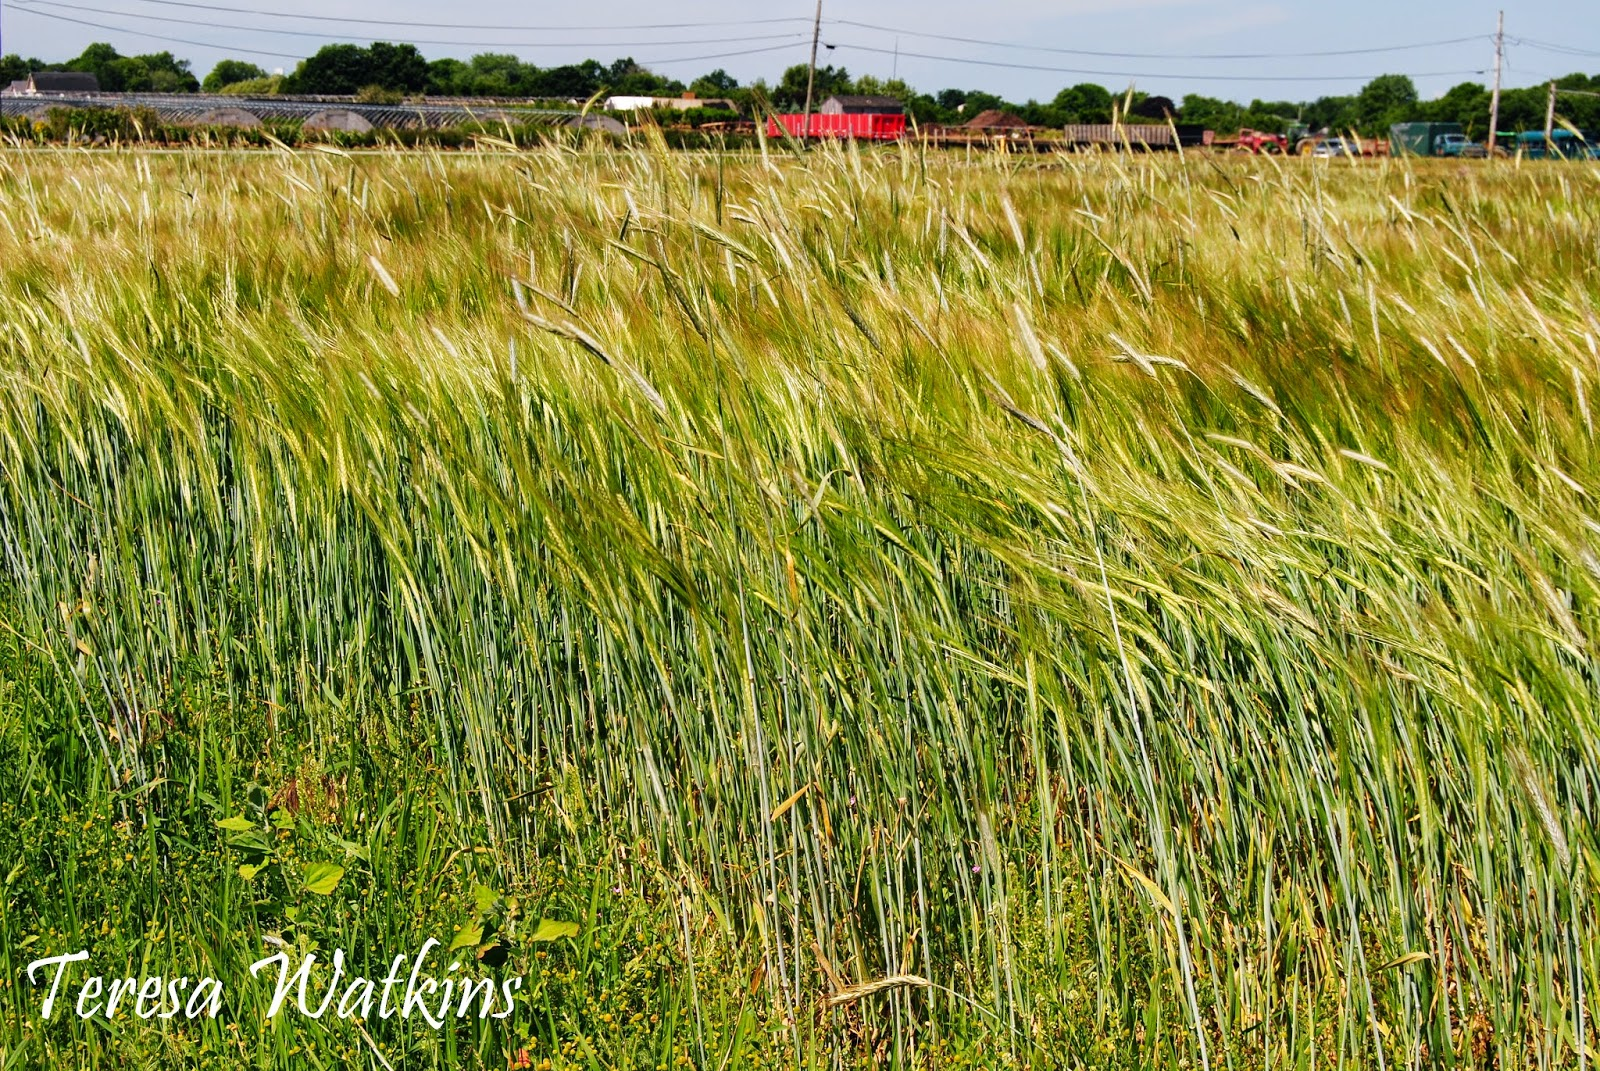 earth shattering gardening john barleycorn to the rescue